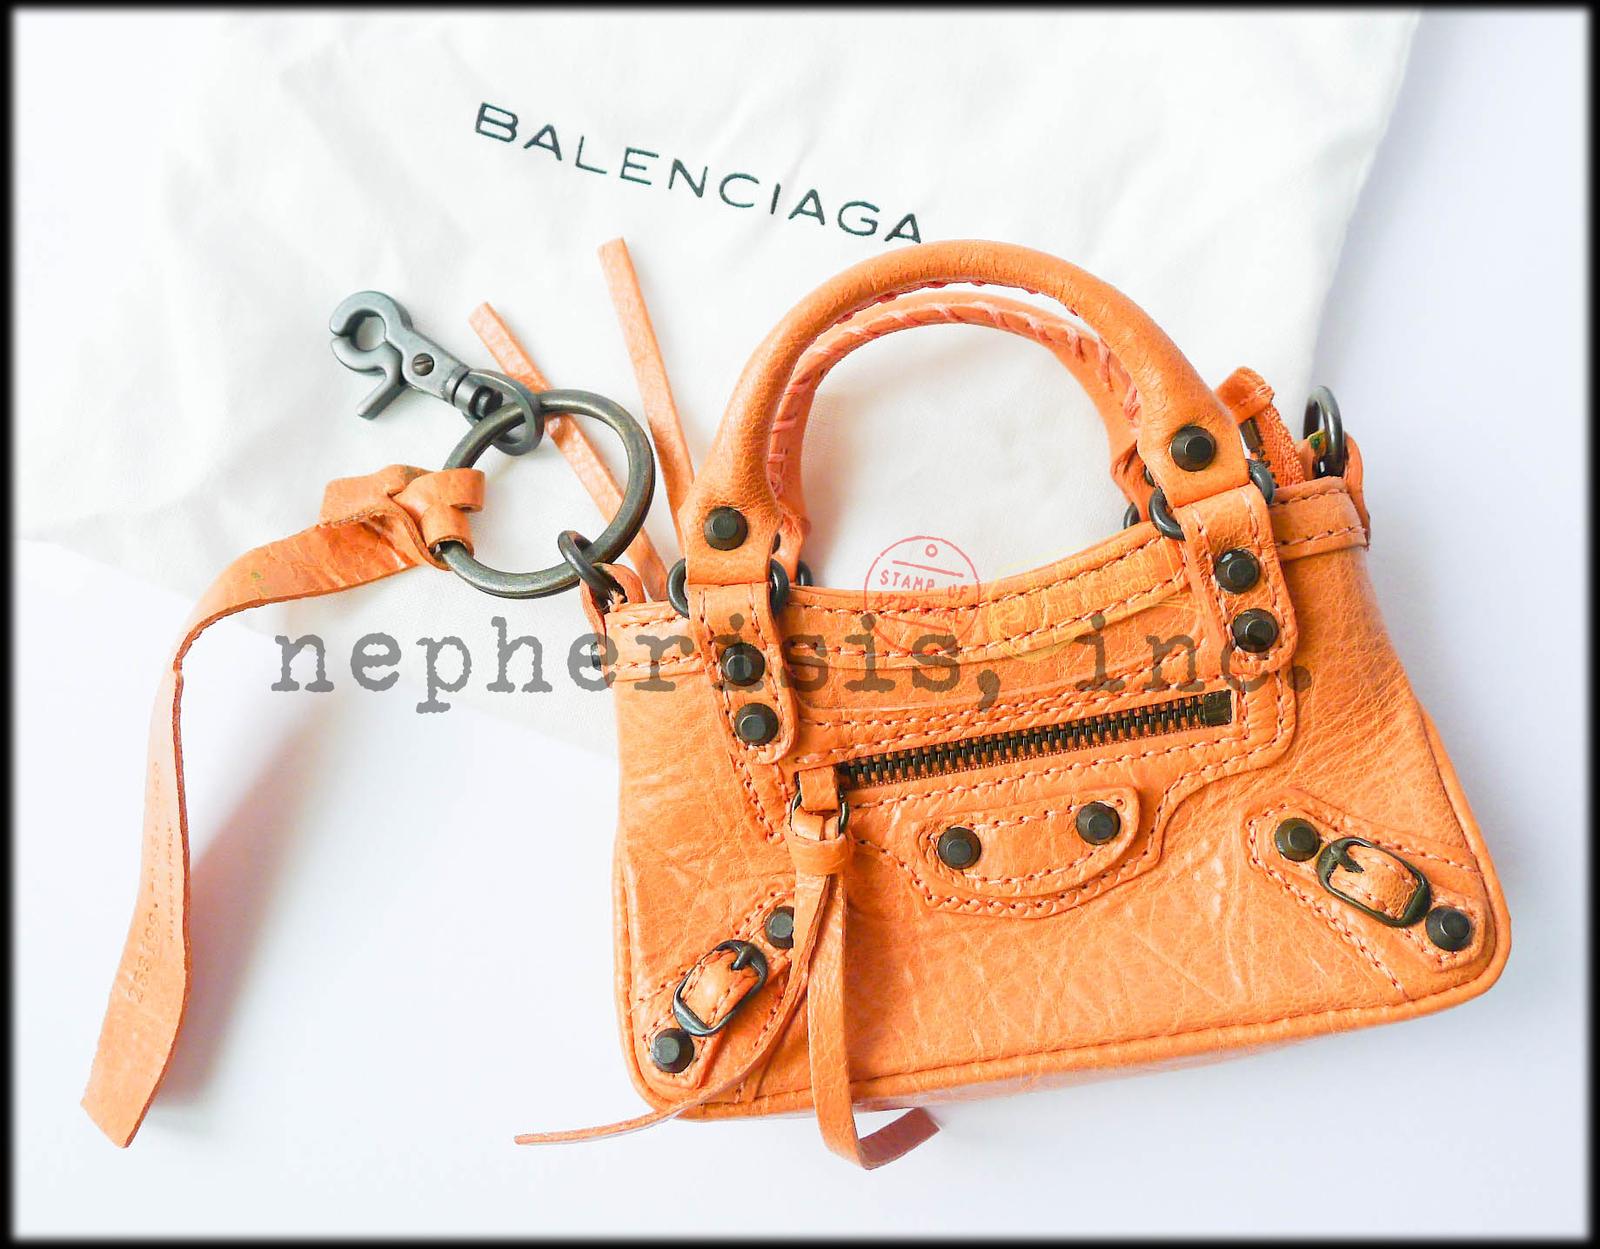 AUTH NEW 2012 Balenciaga MINI MINI FIRST MMF Keychain or Bag Charm ROSE BLUSH